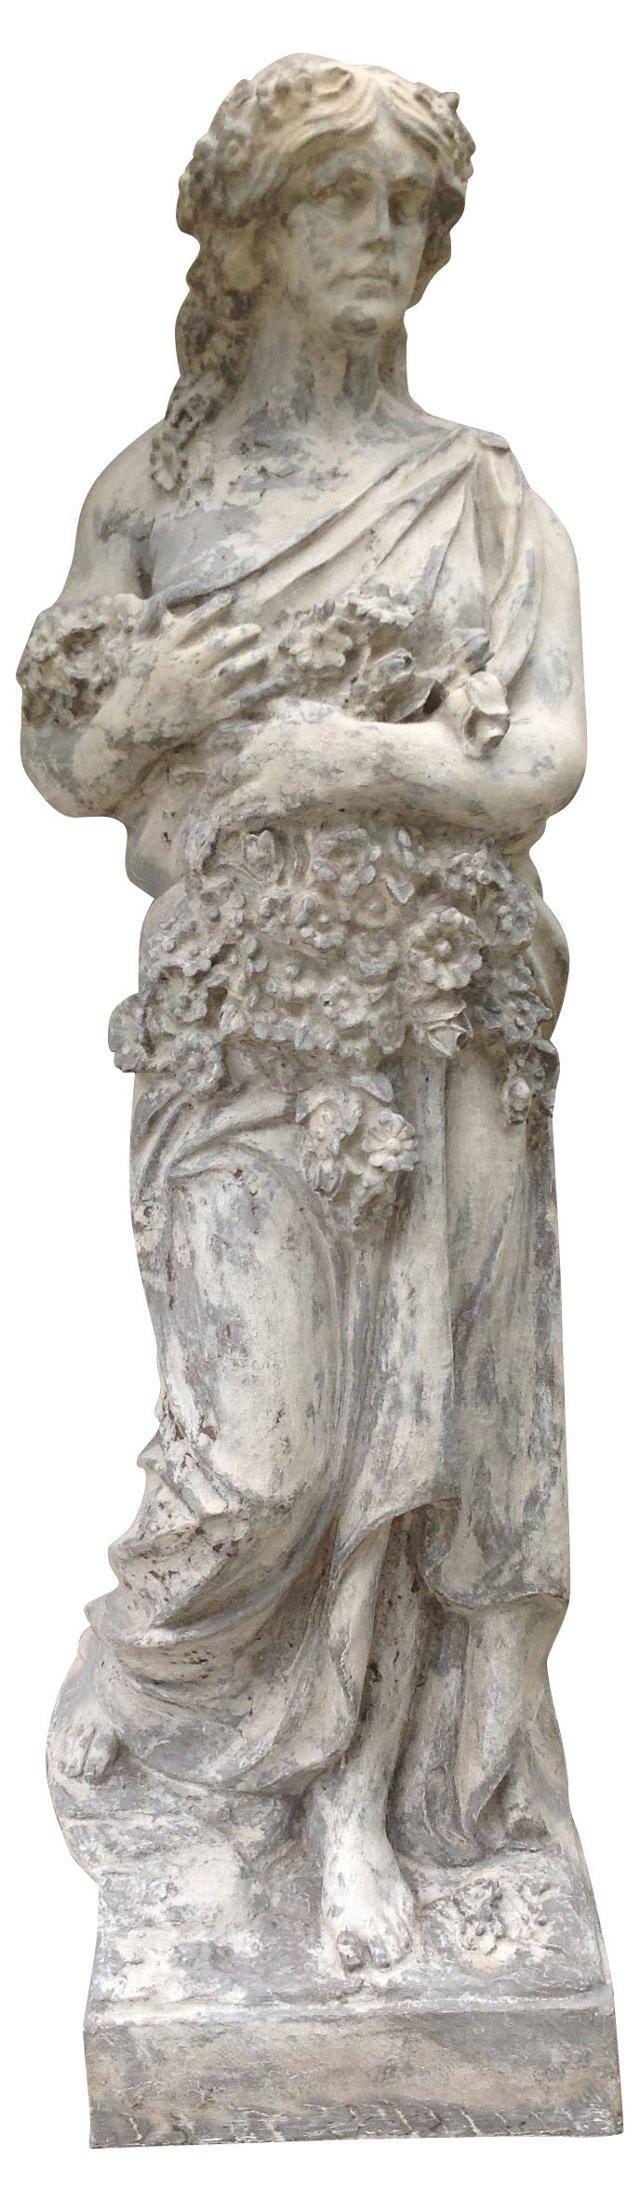 Four Seasons Statue, Summer